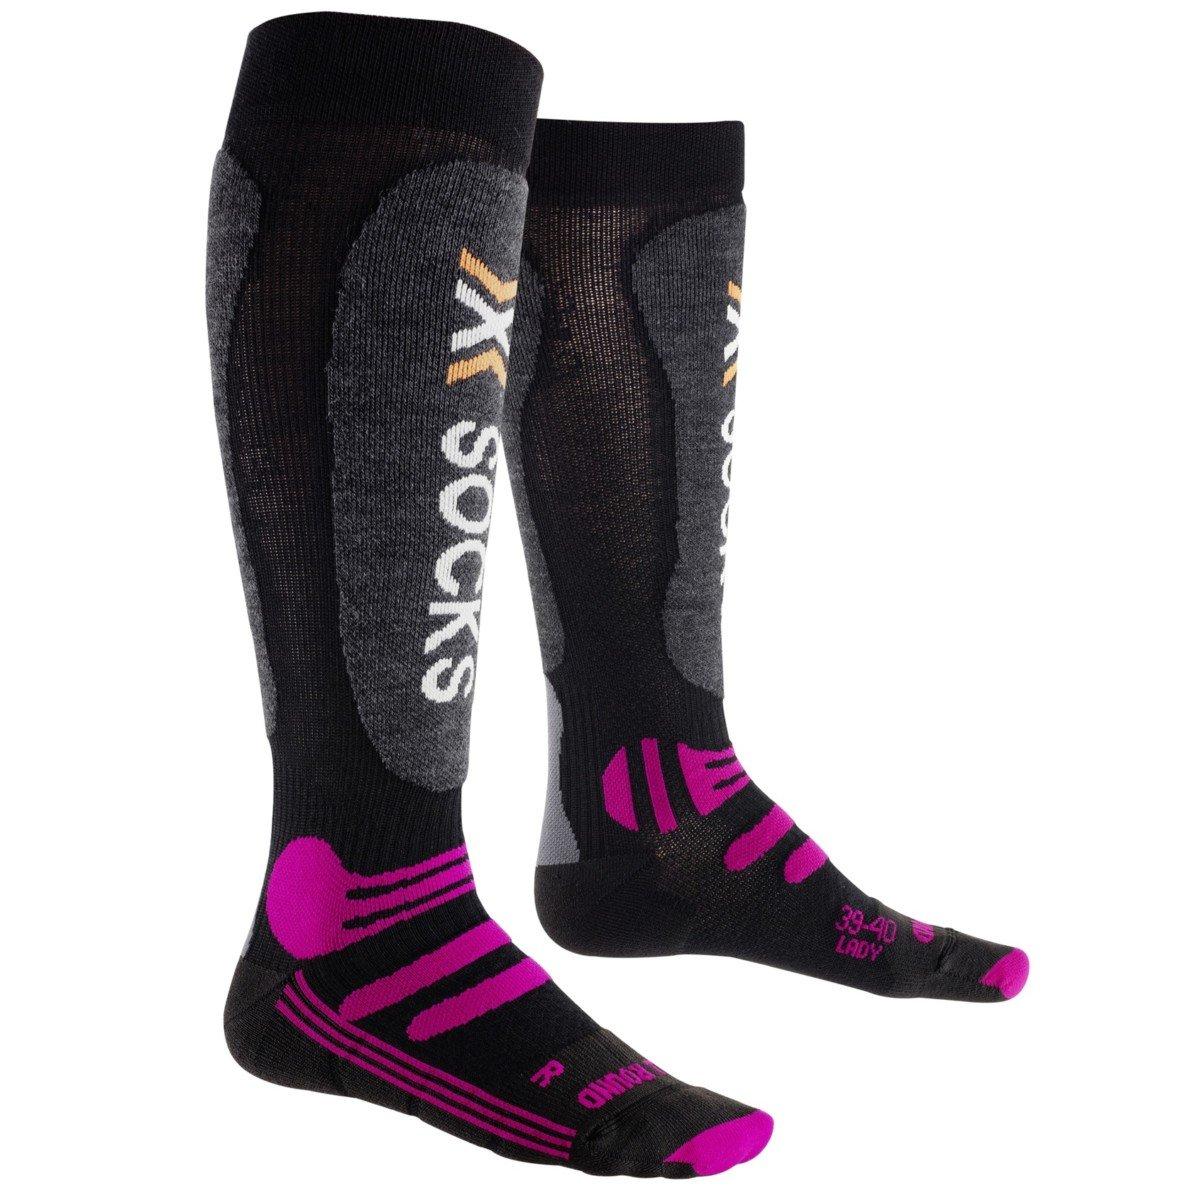 56b1be15653 x-socks-ski all round lady-chaussette-de-ski-femme